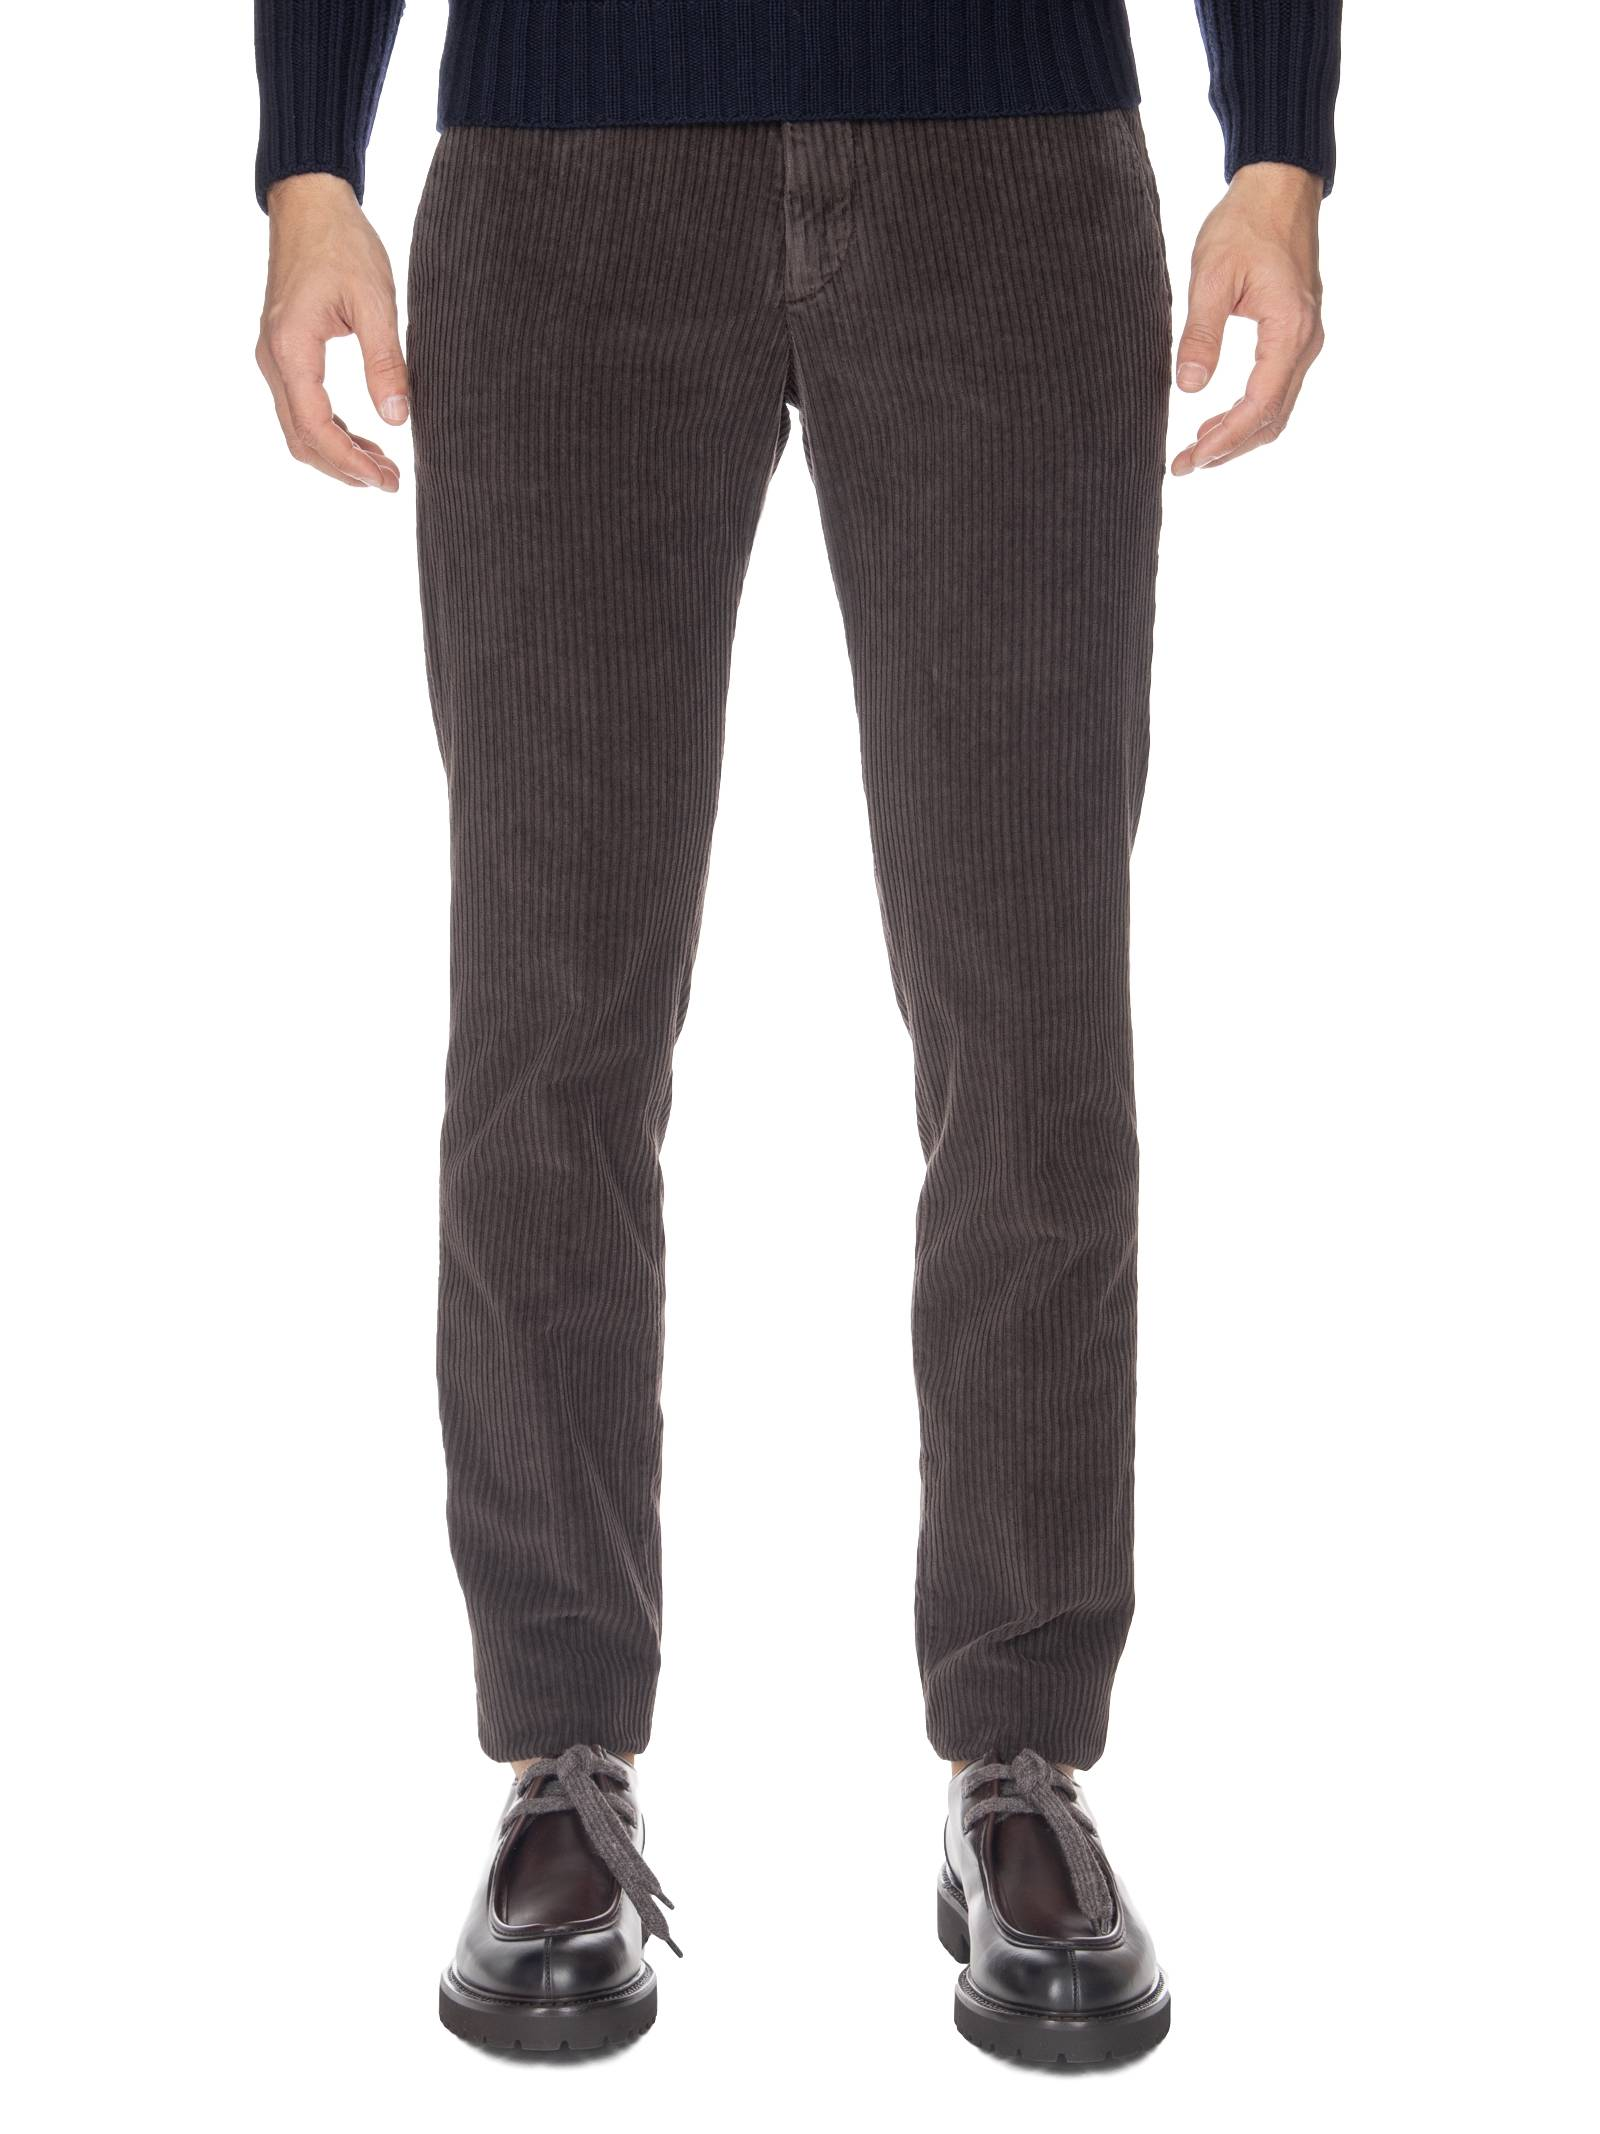 Pantalone Briglia BRIGLIA | 9 | 420721BG05746